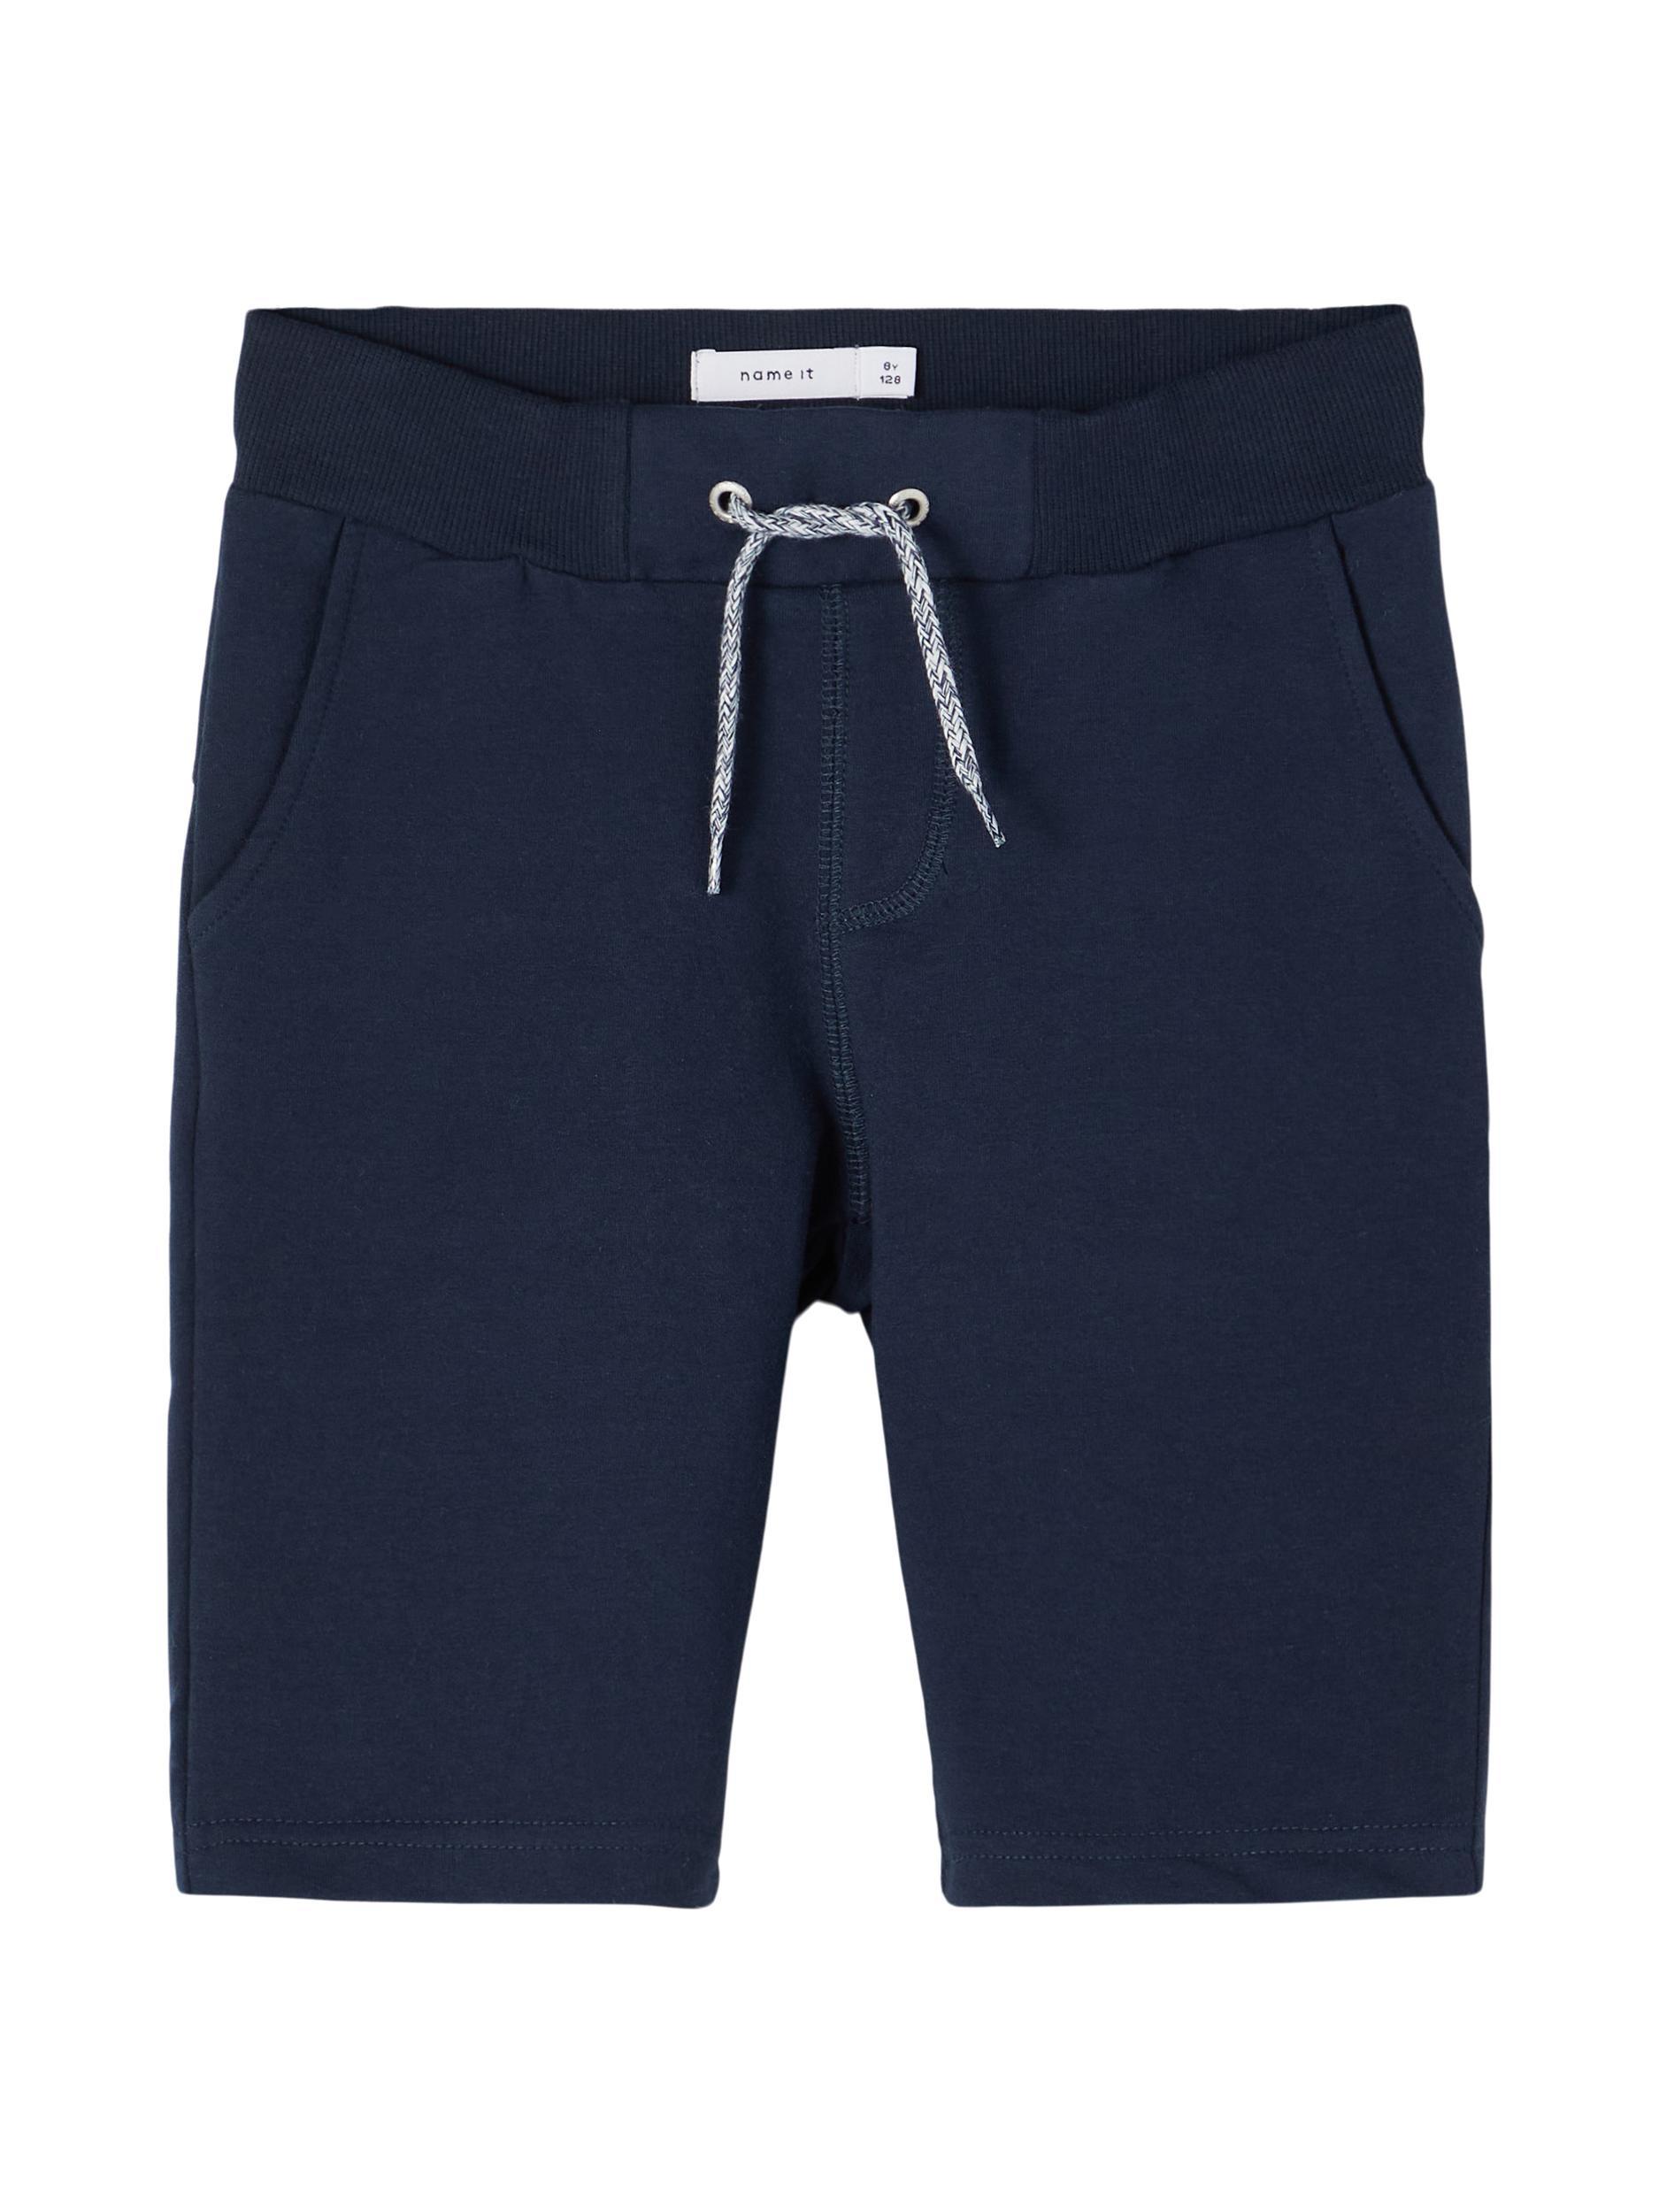 Name It Honk sweat shorts